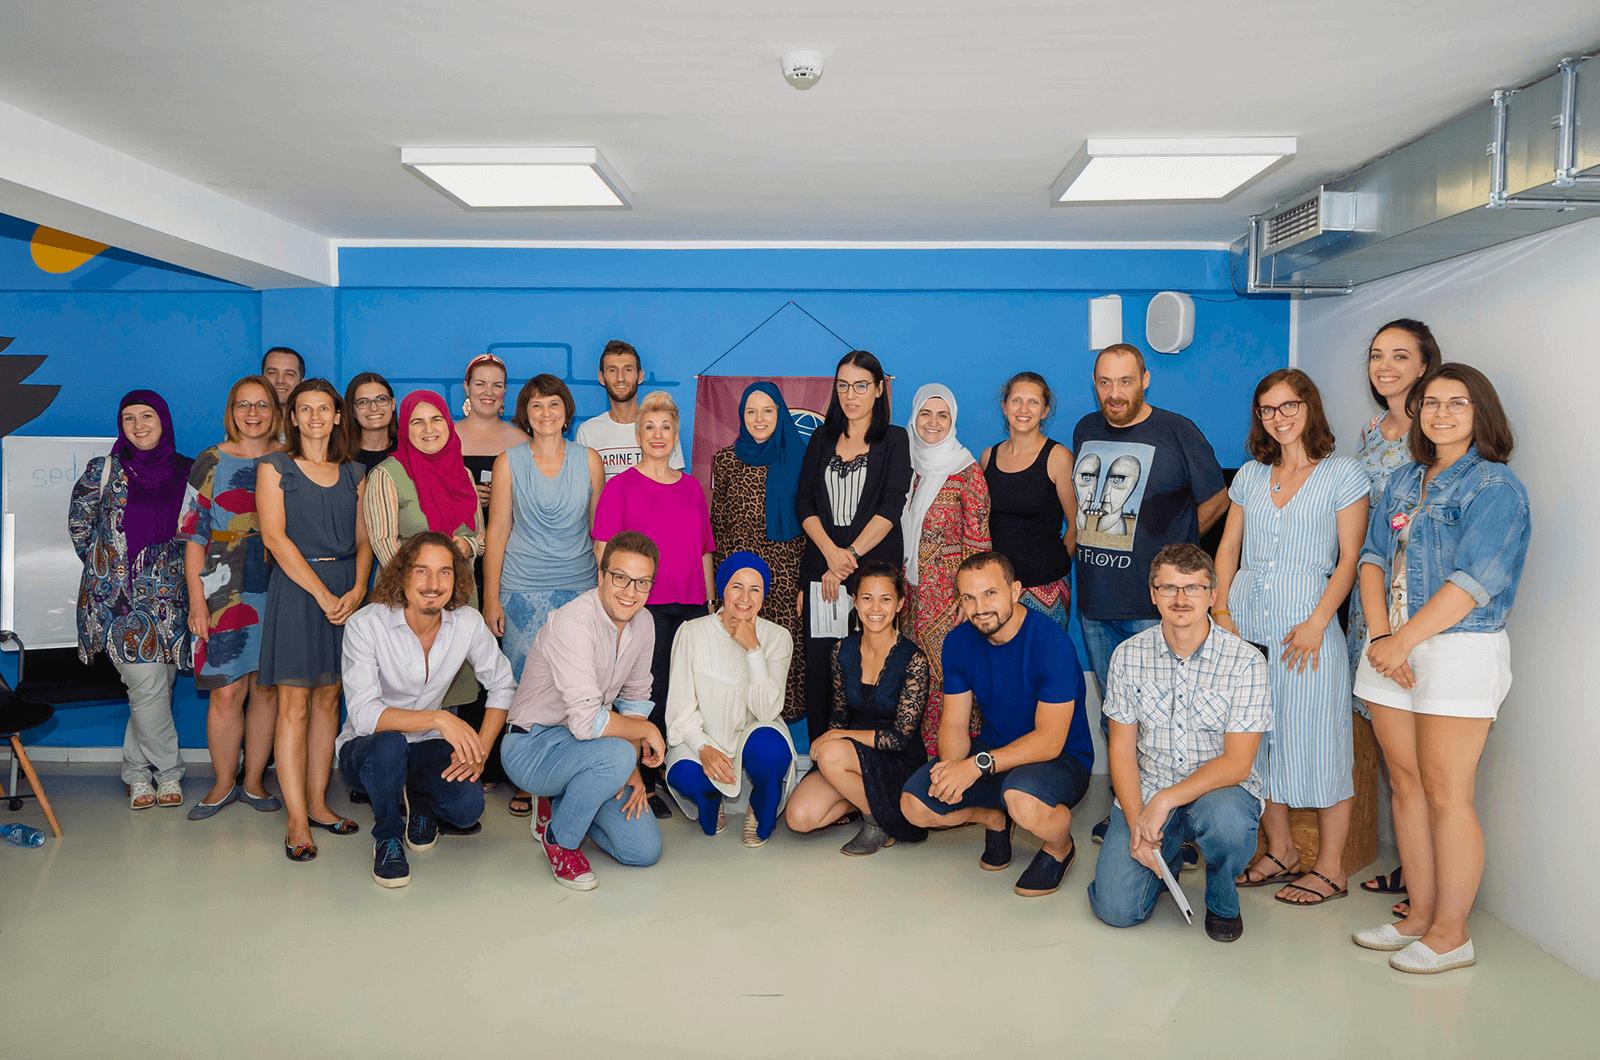 Nudžejma Softić (front row, center), poses with her fellow members of the Sarajevo Toastmasters club in Bosnia and Herzegovina.